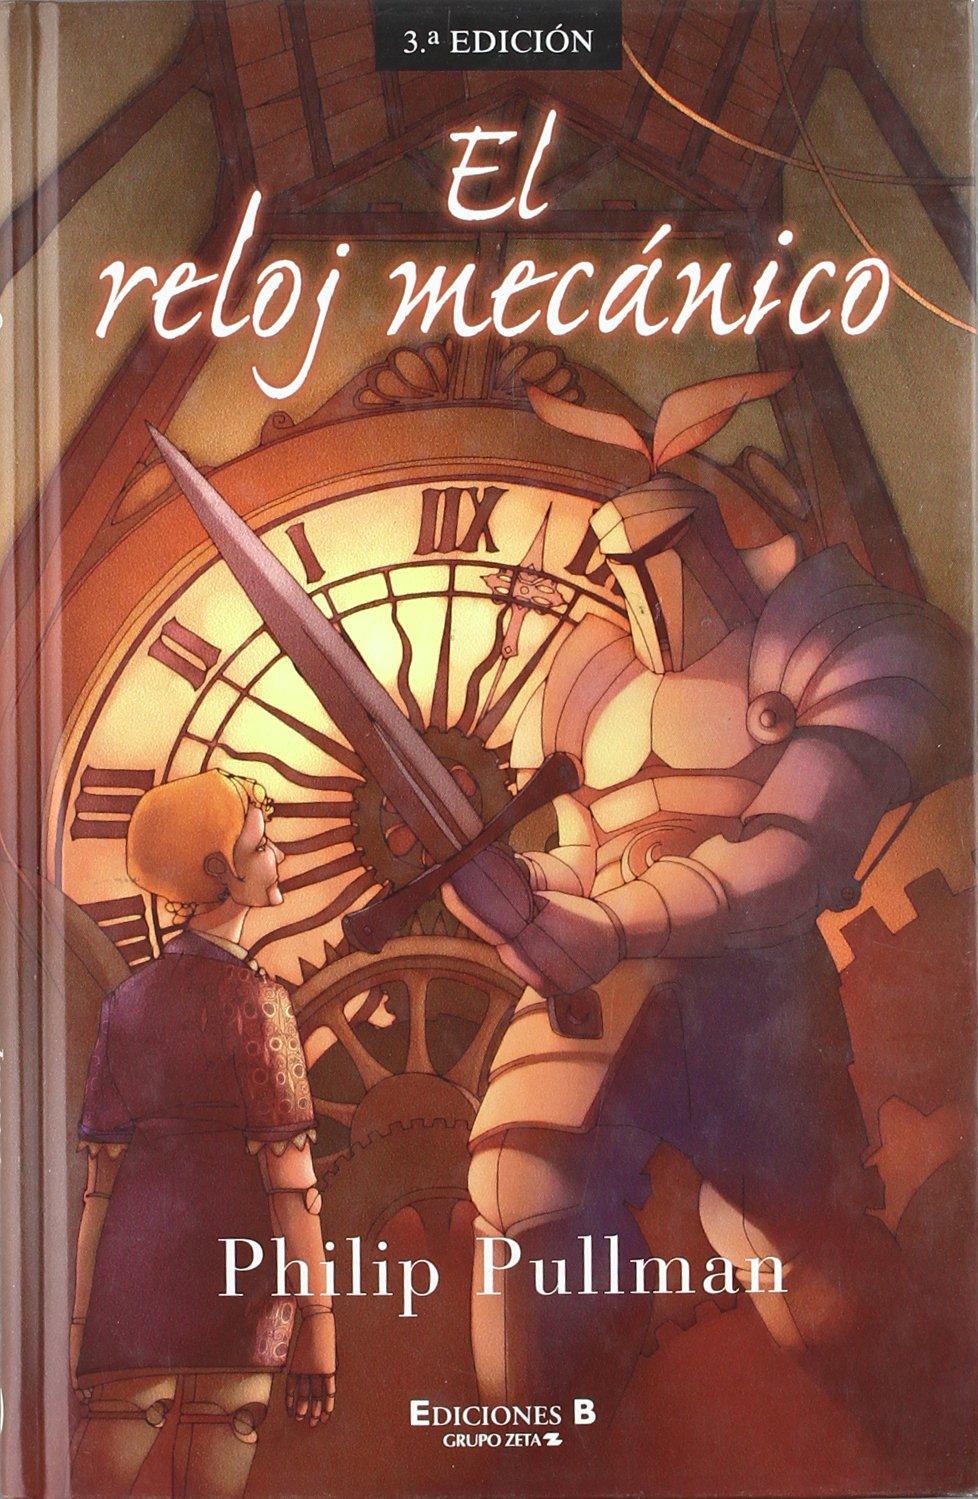 El reloj mecanico Hardcover – November 1, 2005